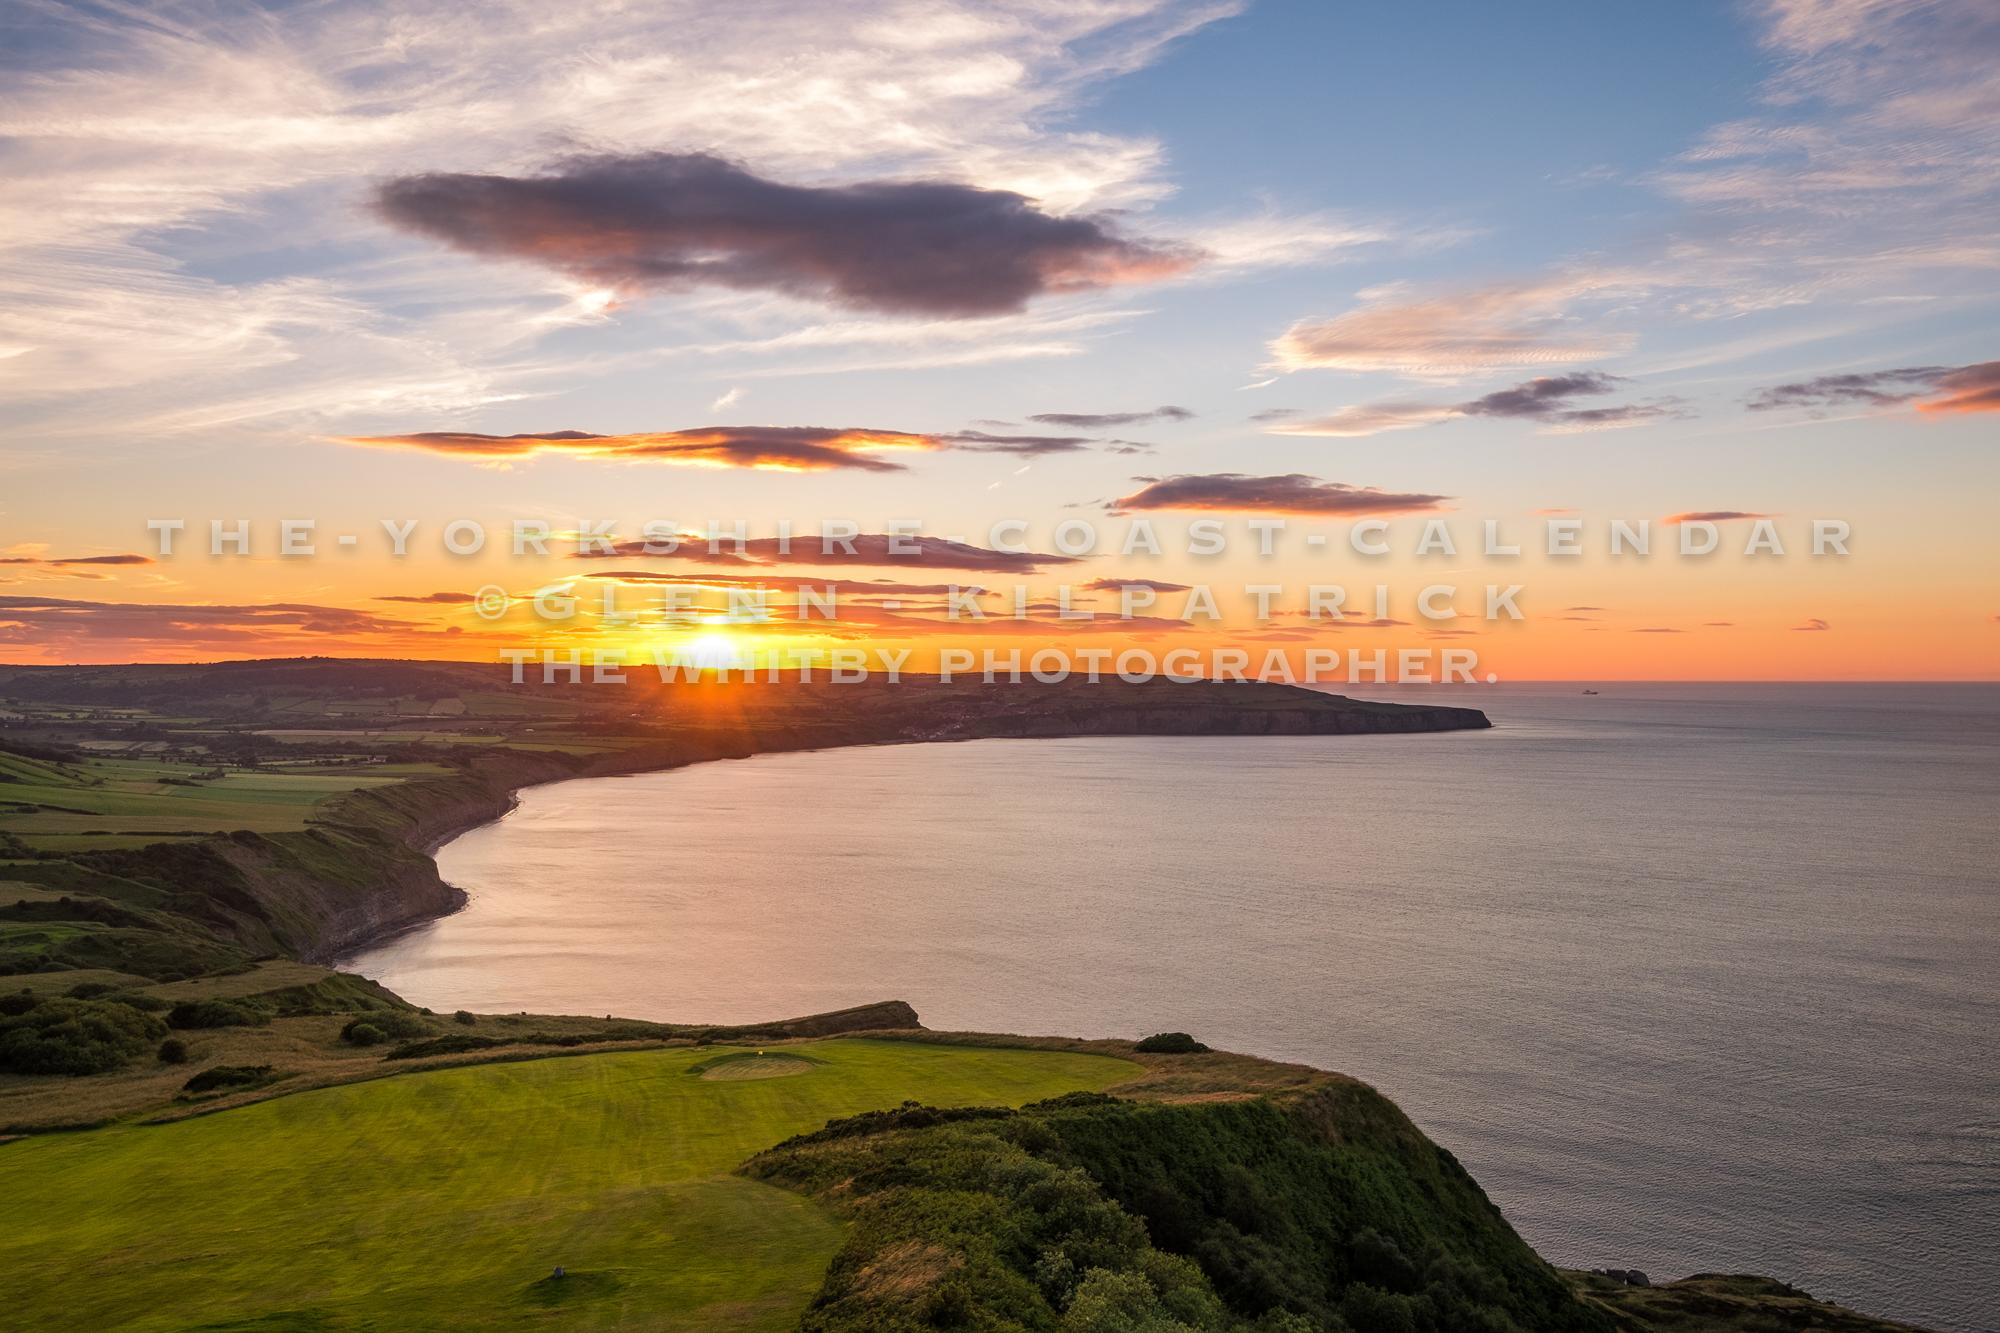 Sunset Over Robin Hoods Bay. Taken From Ravenscar - The Yorkshire Coast Calendar 2018 By Glenn Kilpatrick.